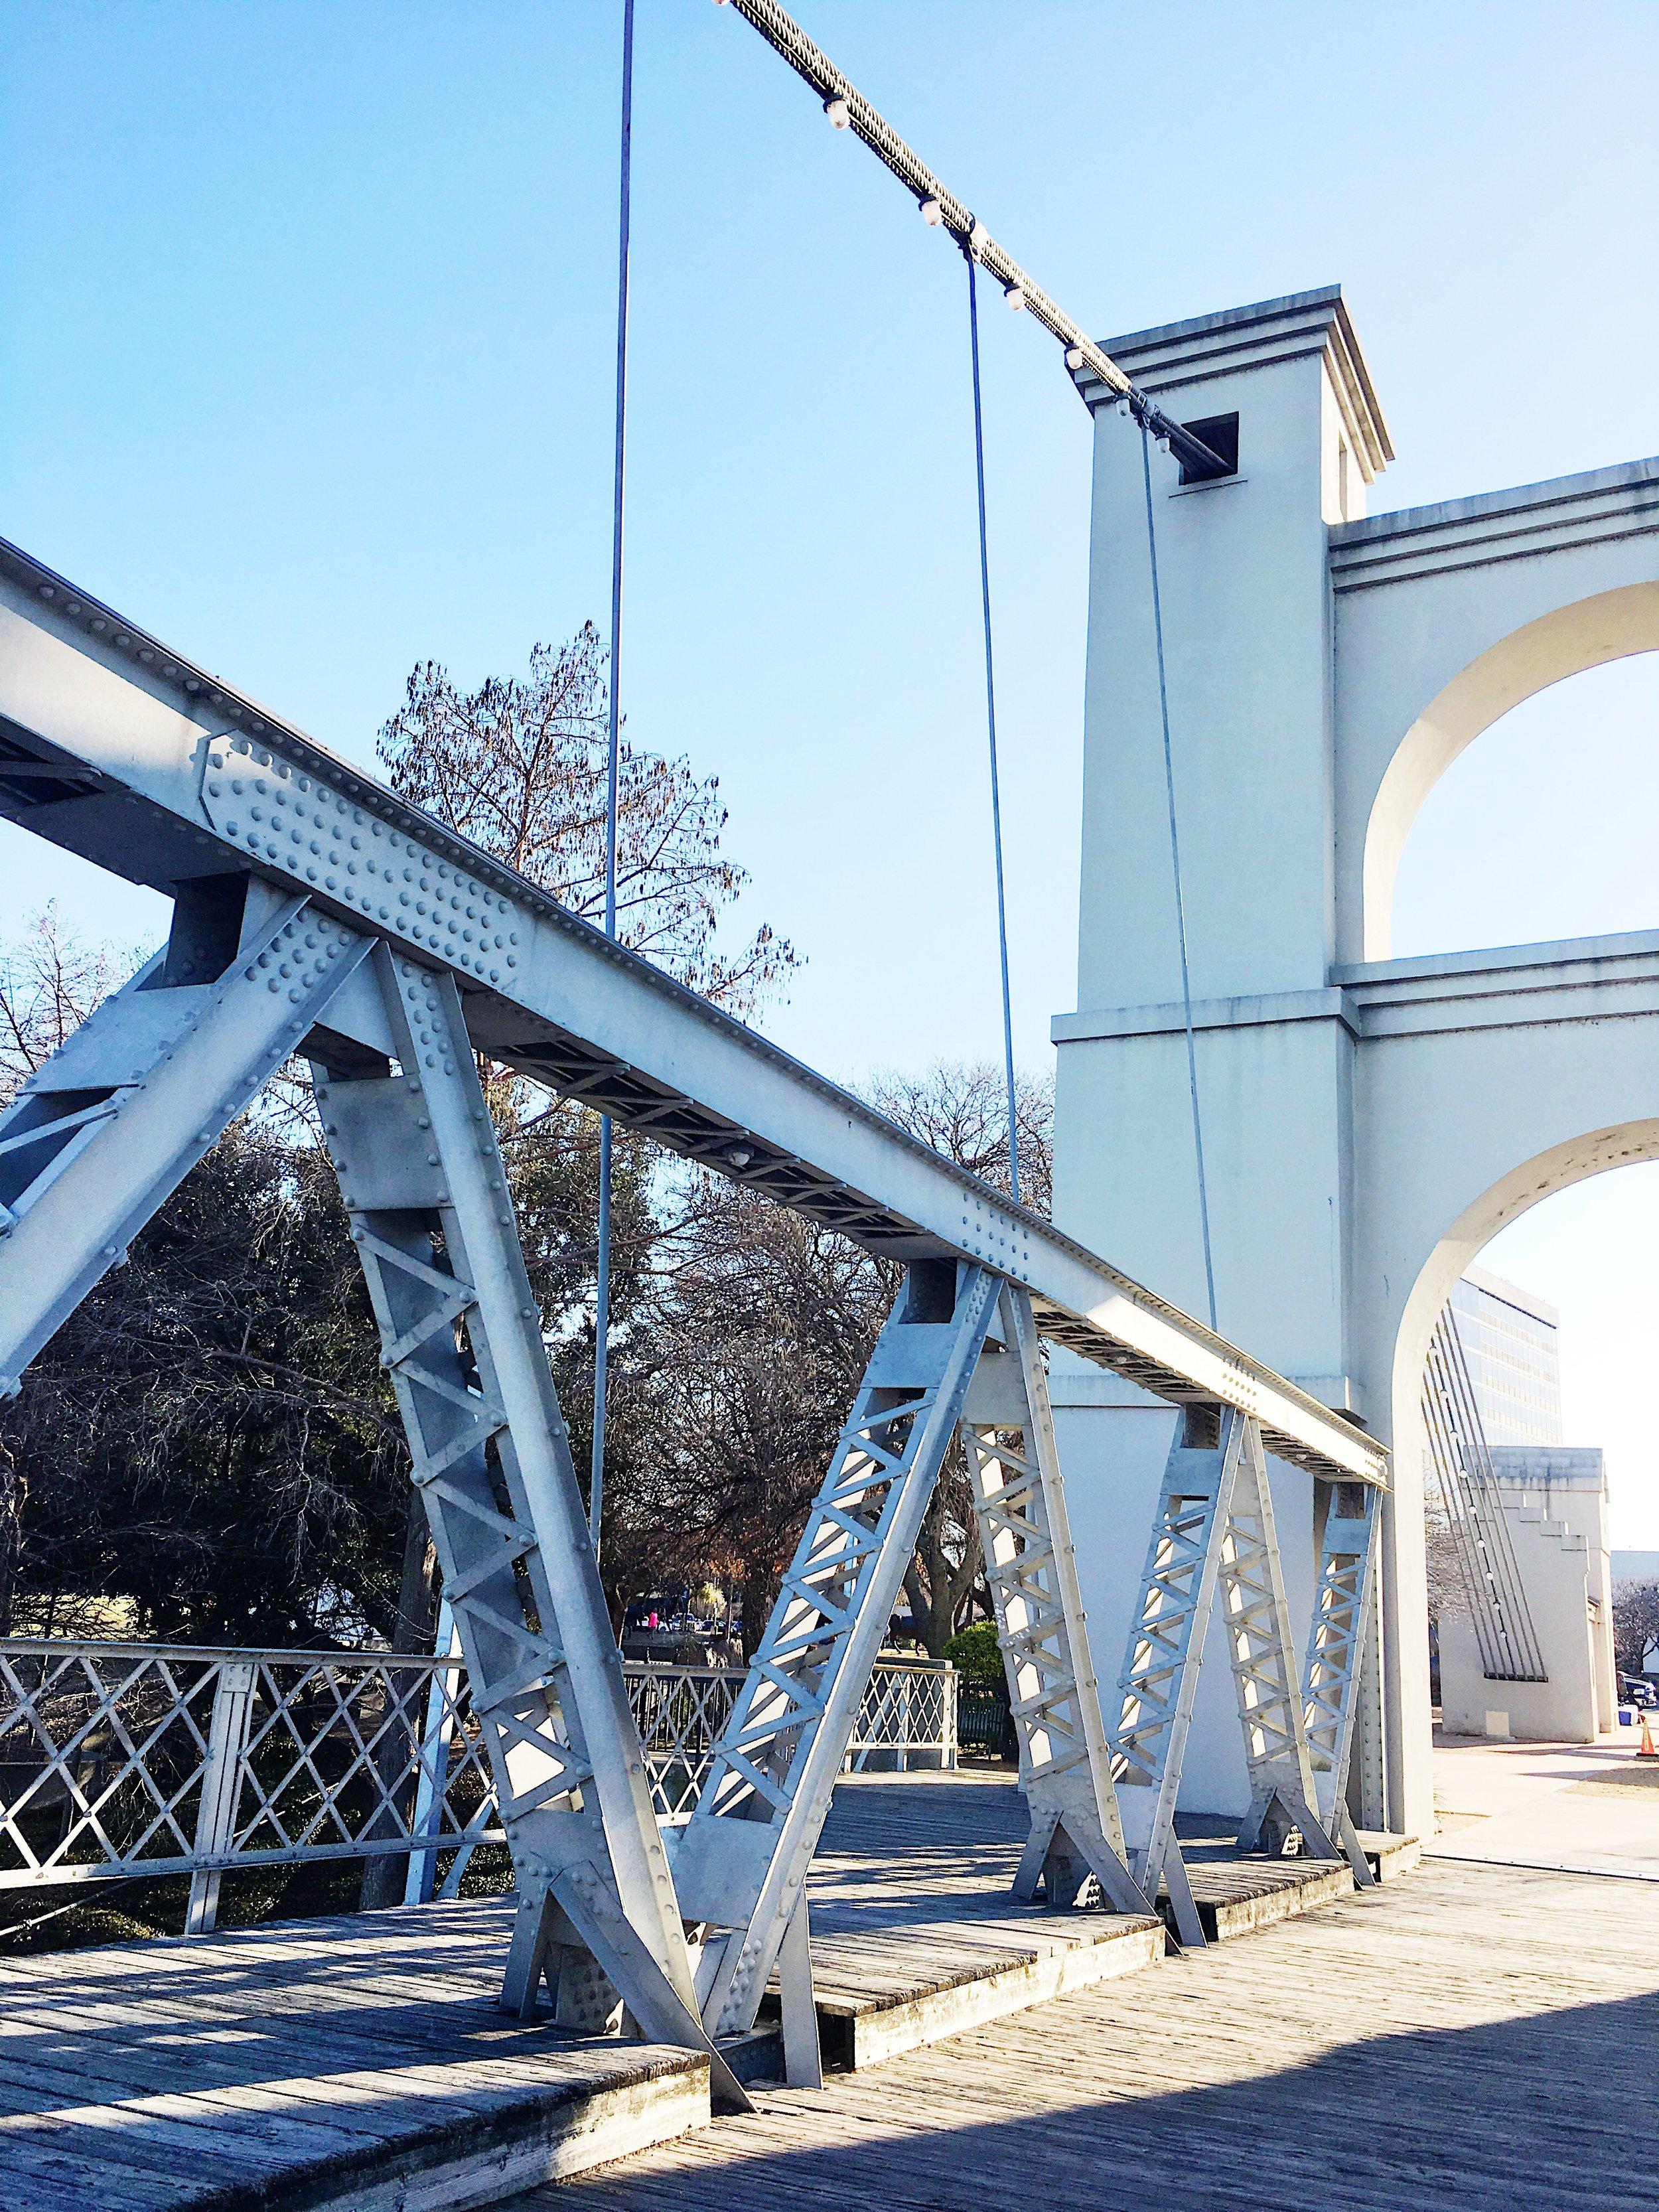 Waco Bridge - Things to do in Waco, Texas (2).JPG